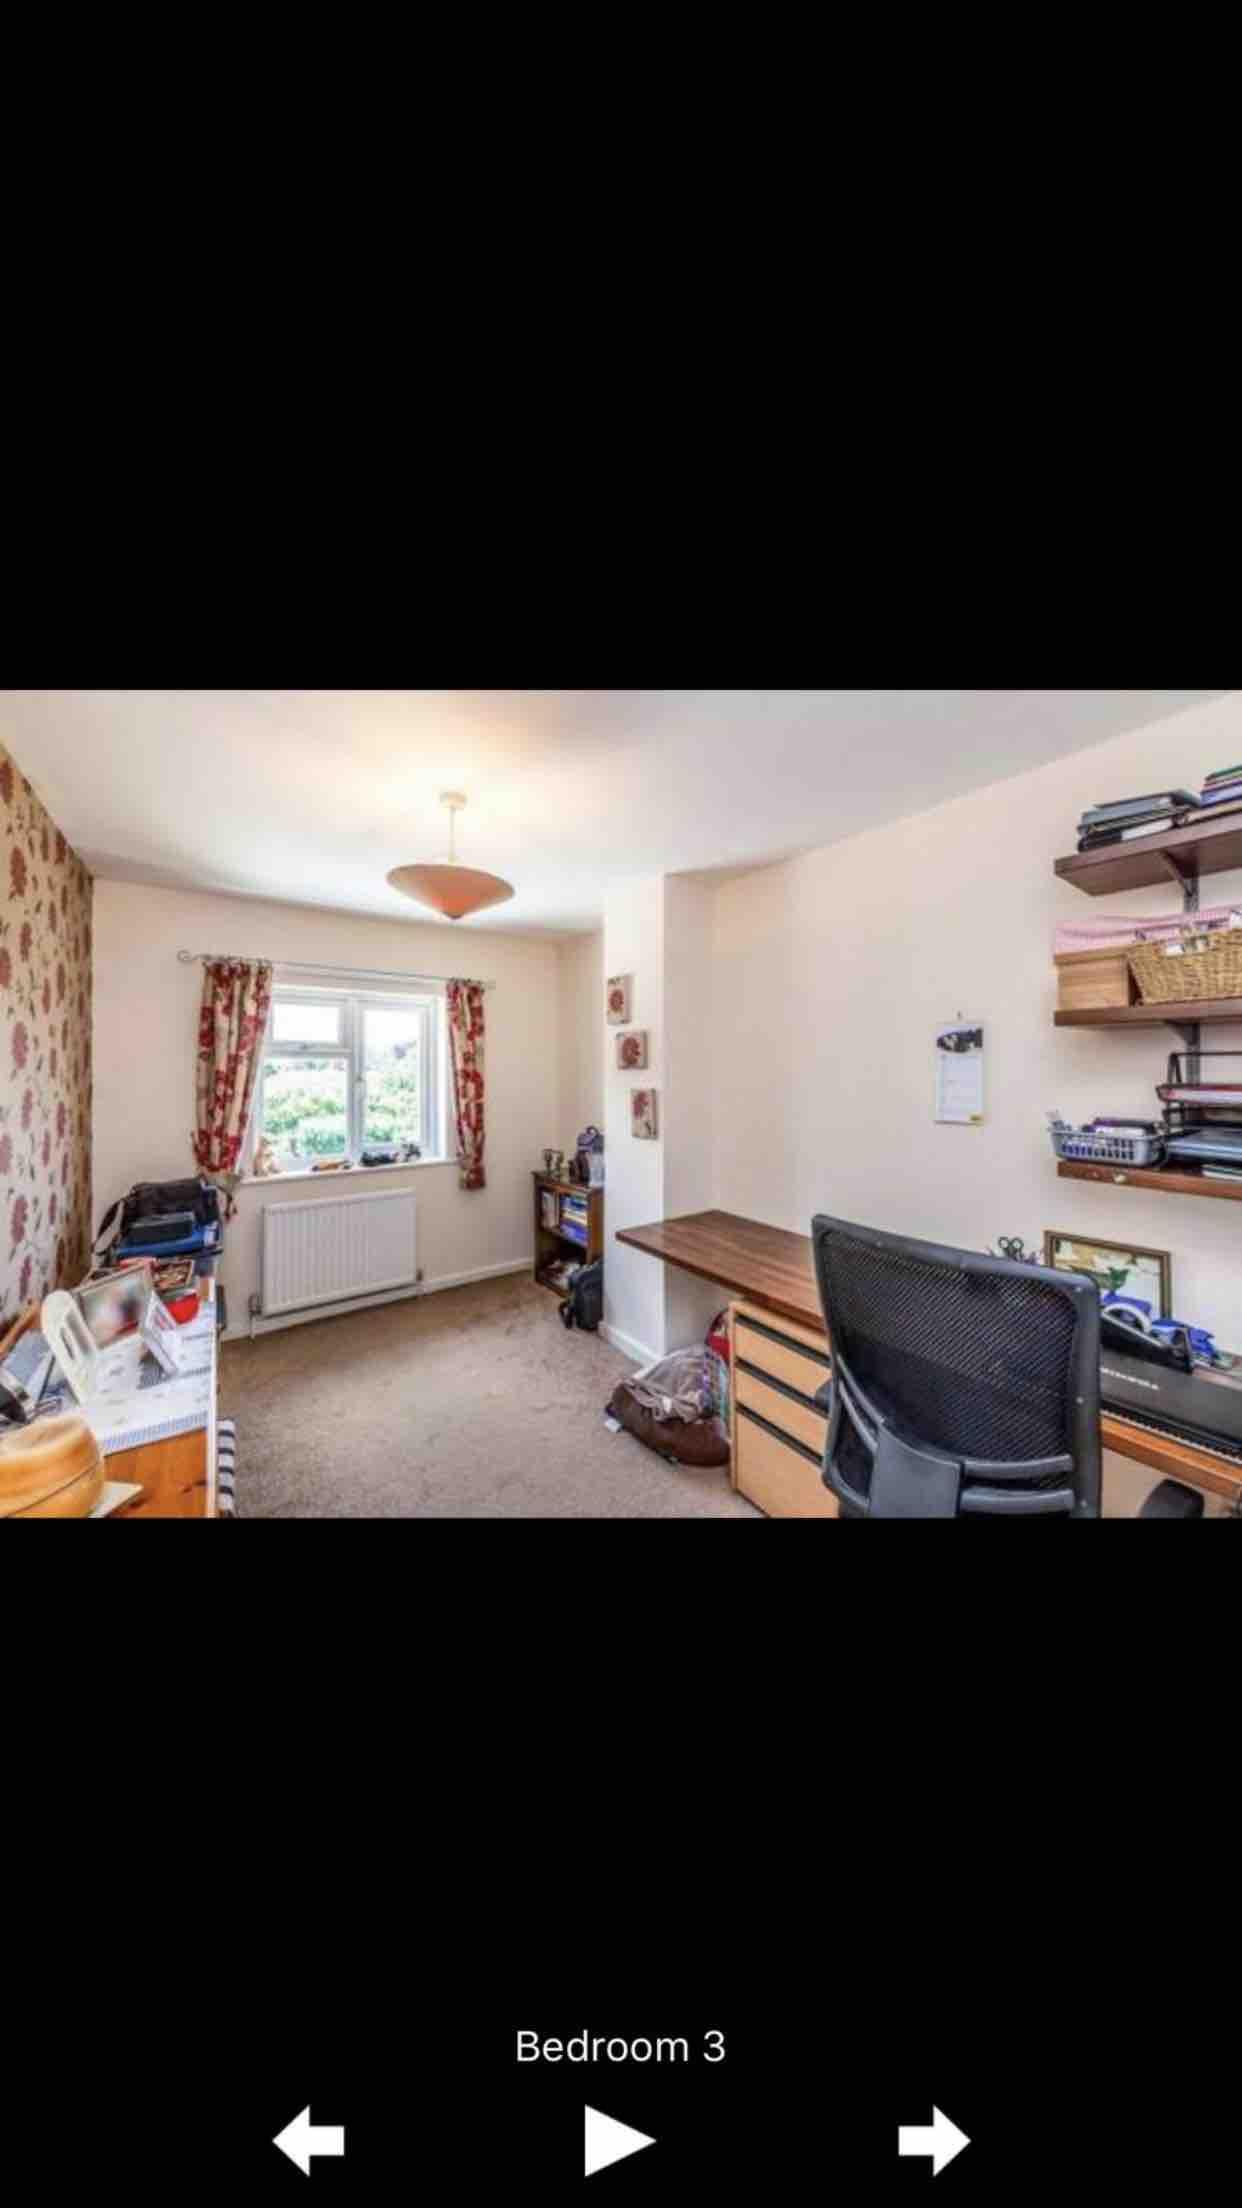 1 room in Fallings Park, Wolverhampton, WV10 0NJ RoomsLocal image